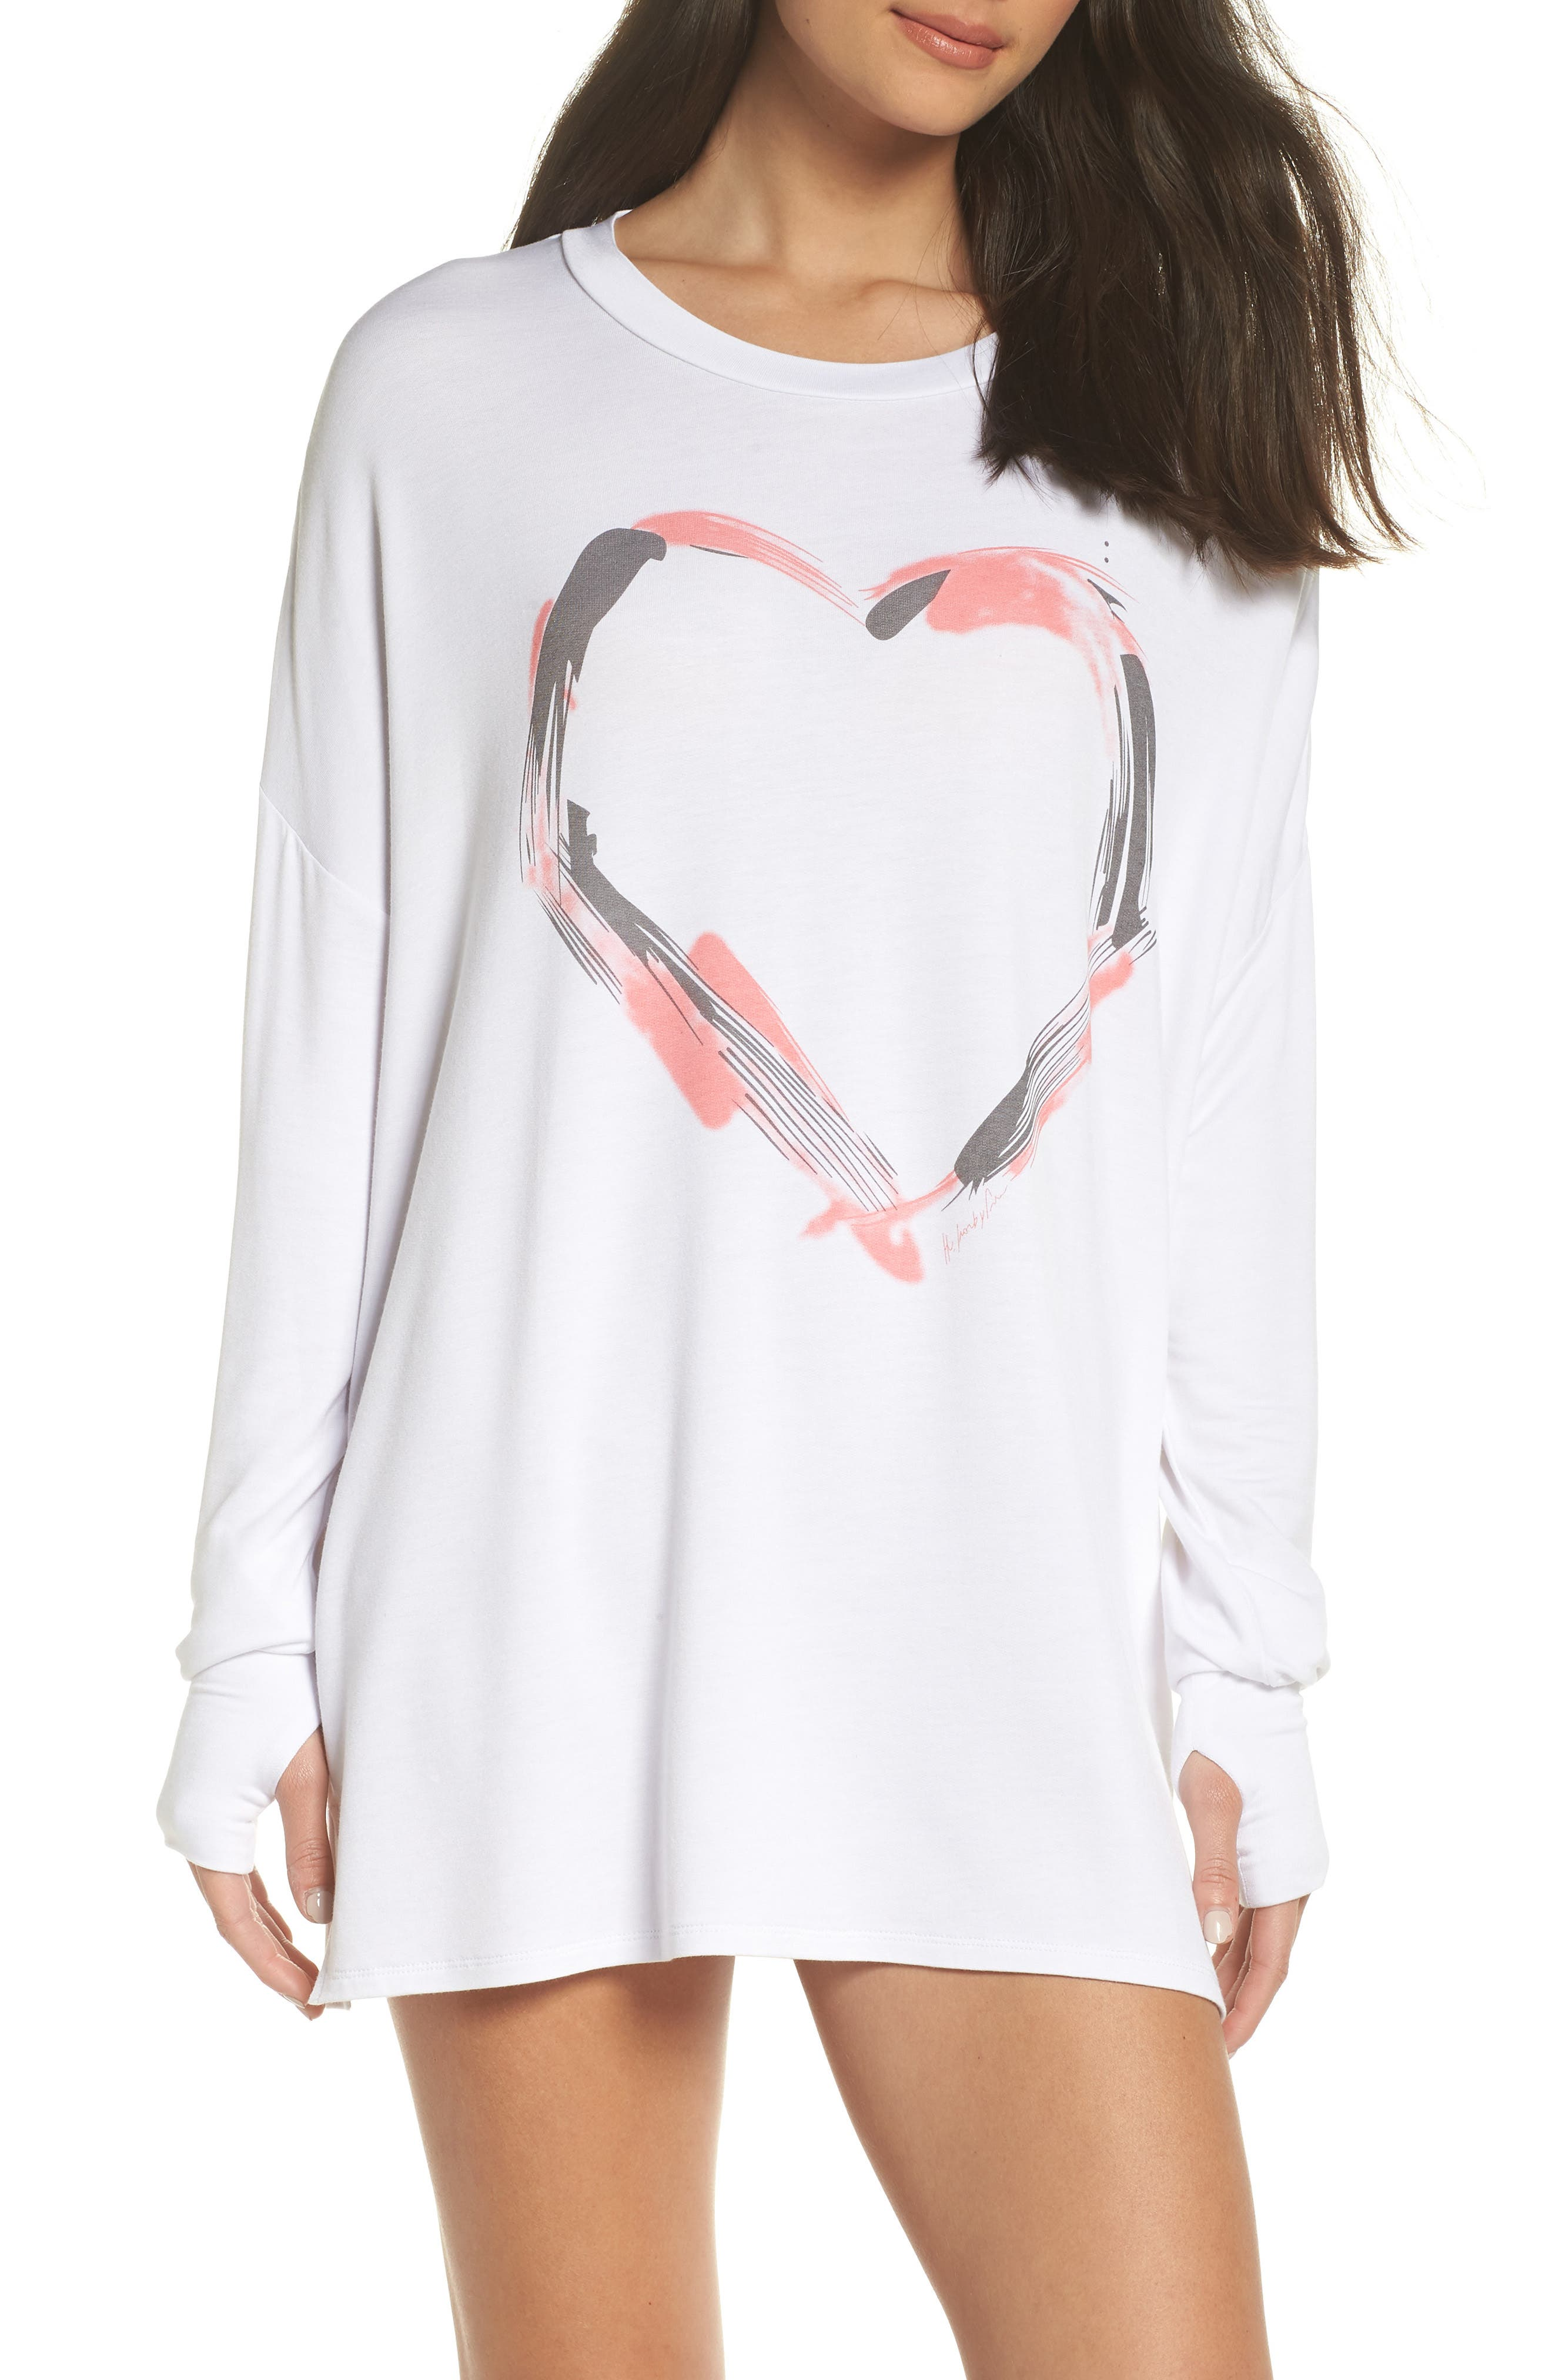 Heart Strokes Sleep Shirt,                             Main thumbnail 1, color,                             100